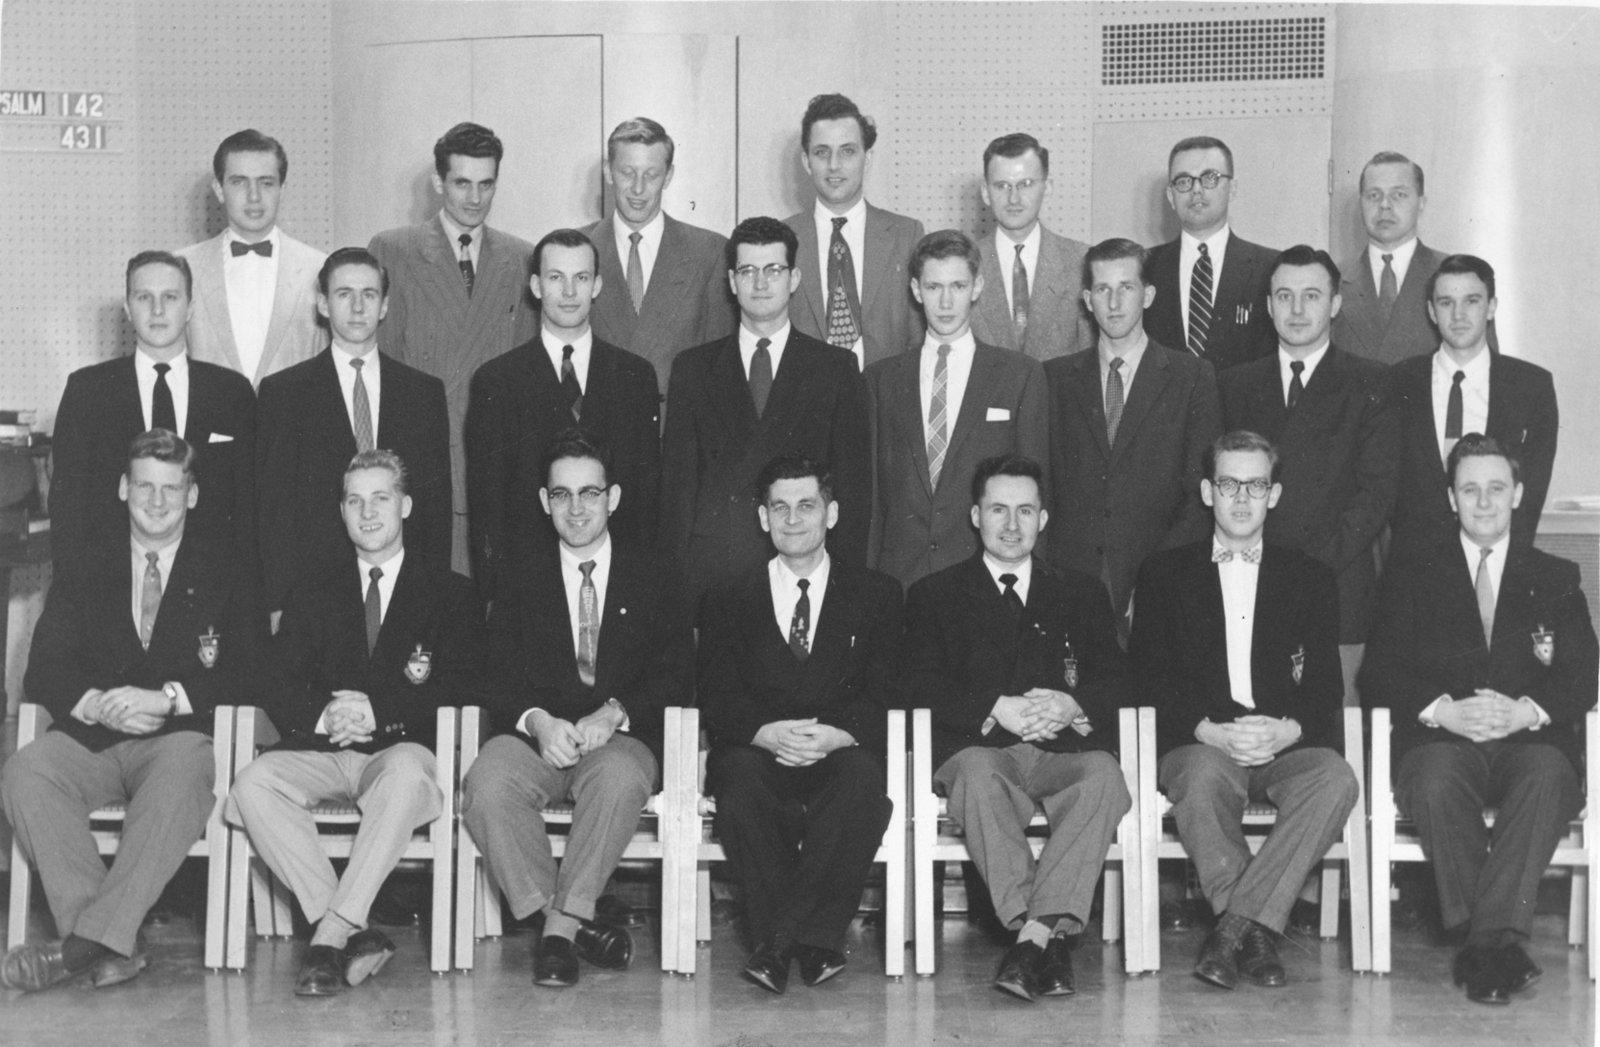 Waterloo Lutheran Seminary Male Chorus, 1955-56